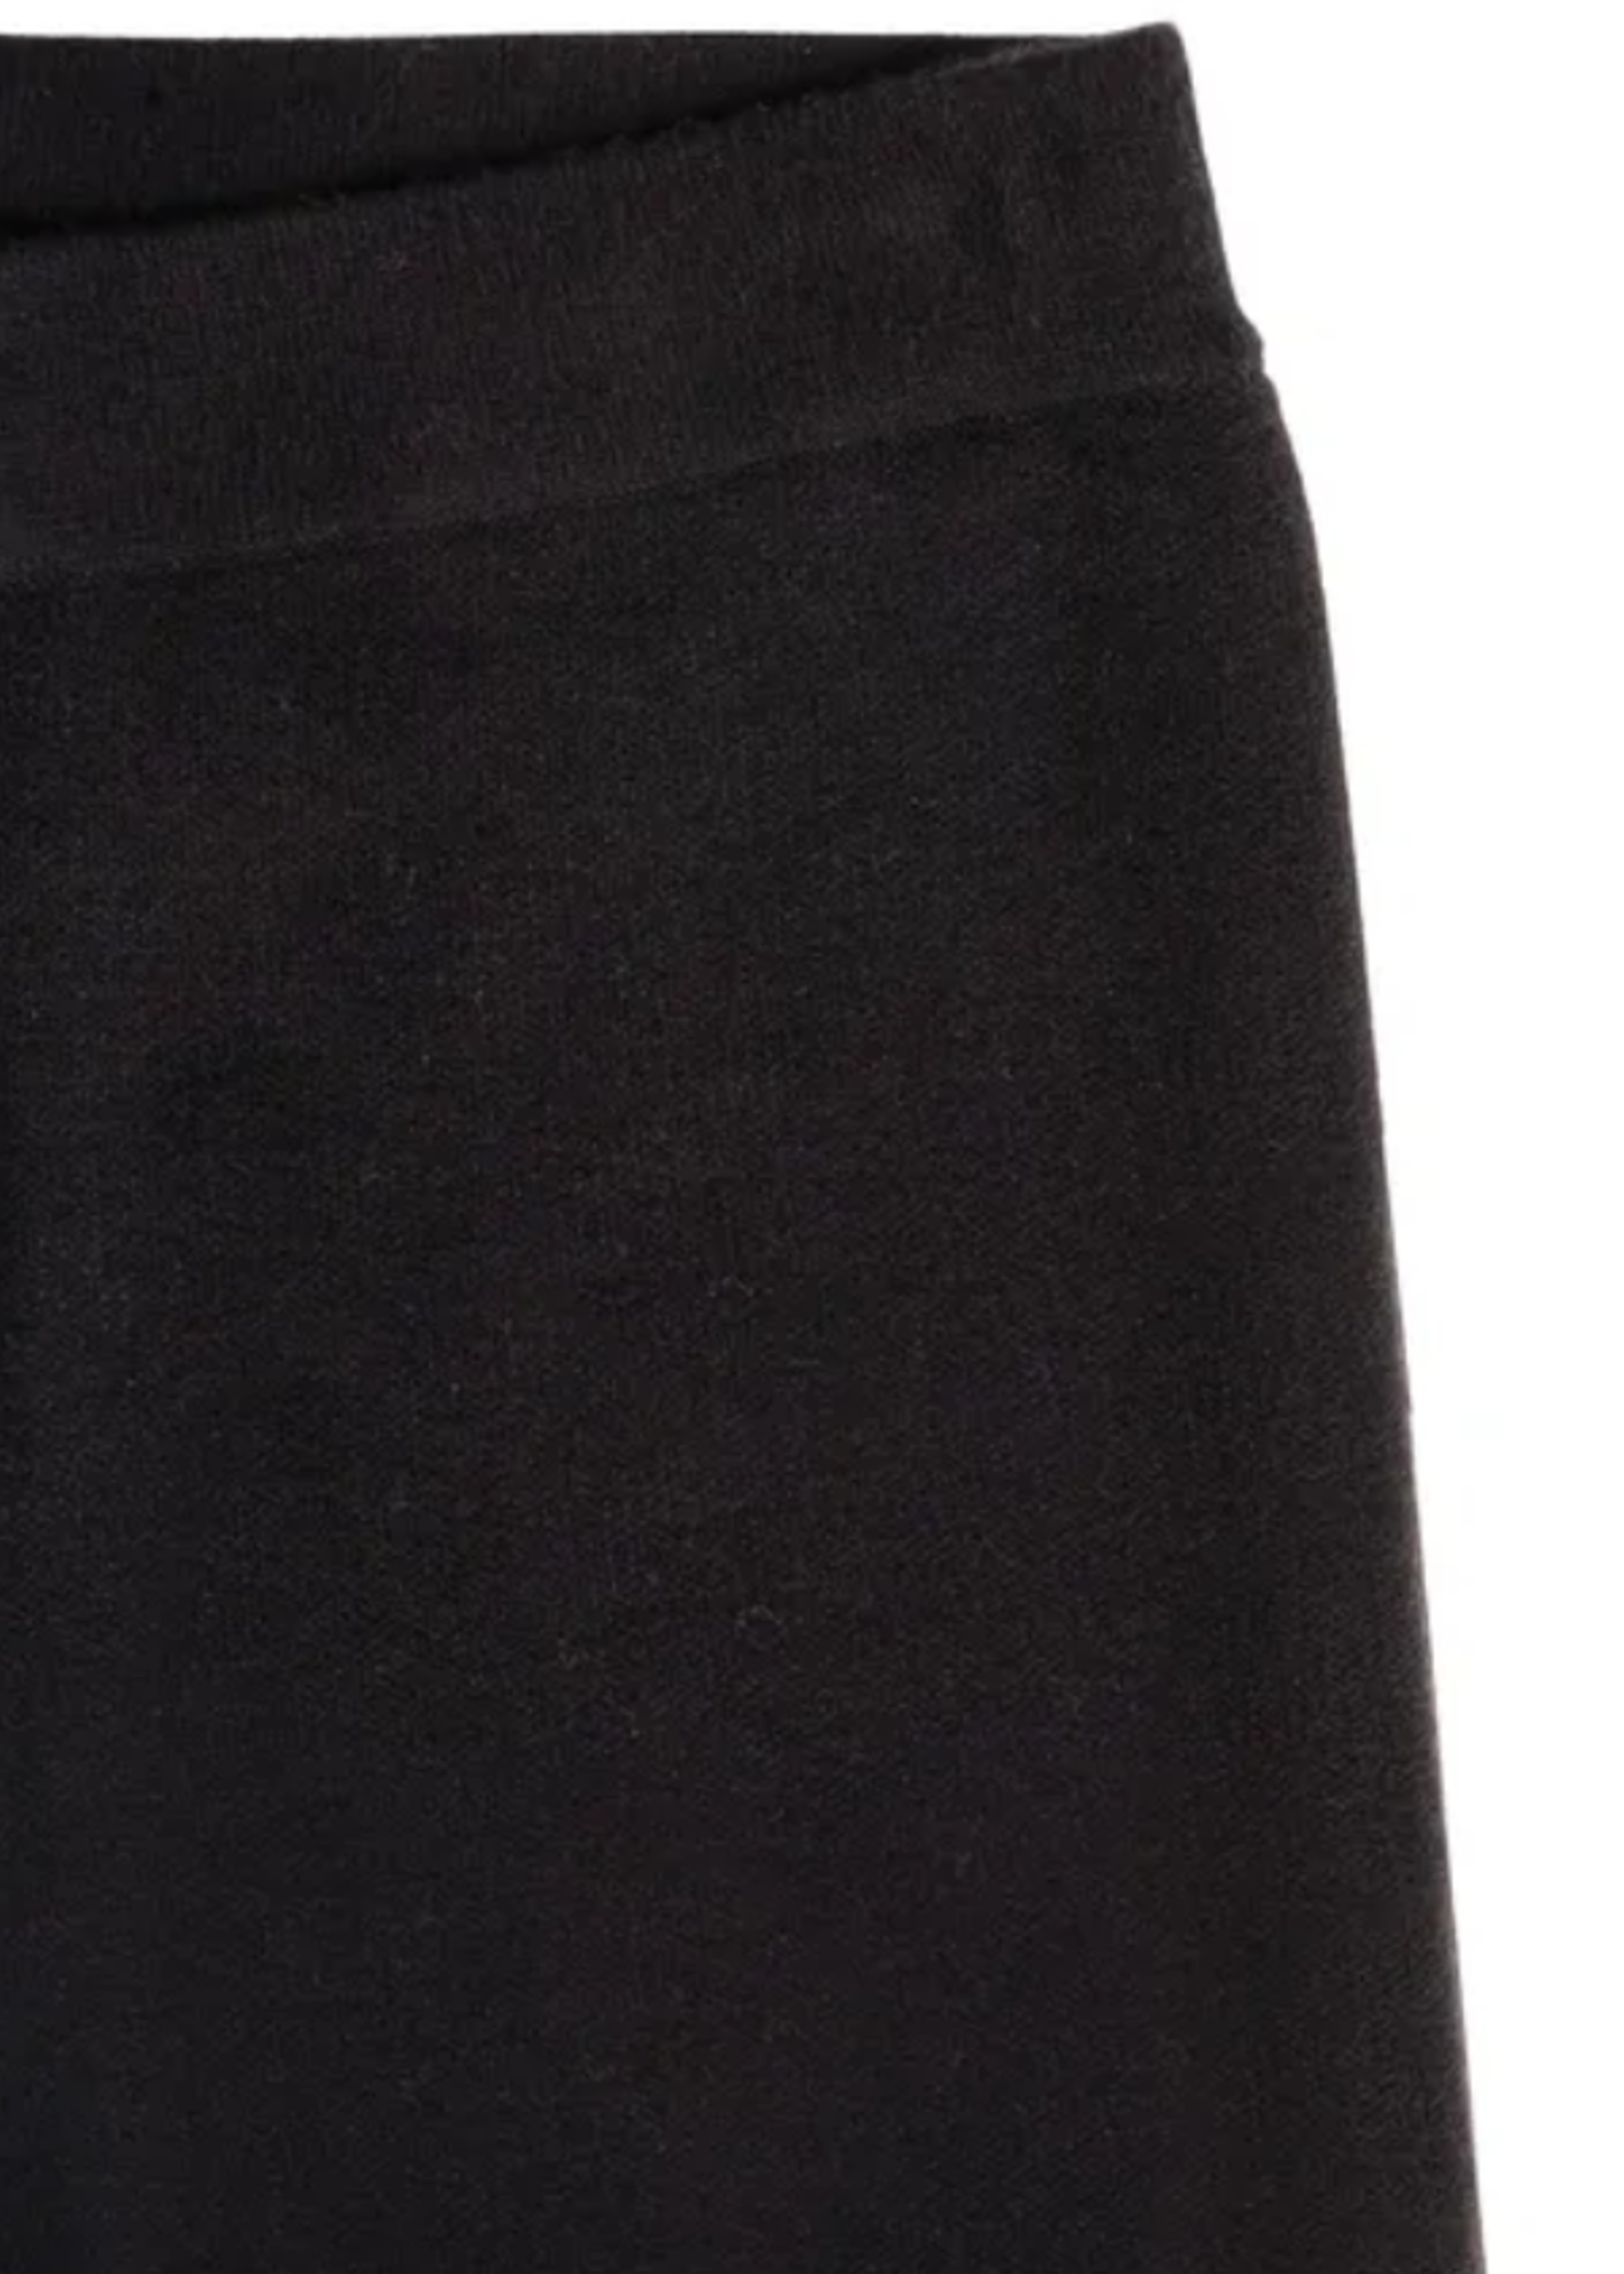 Zusss Gebreide broek zwart